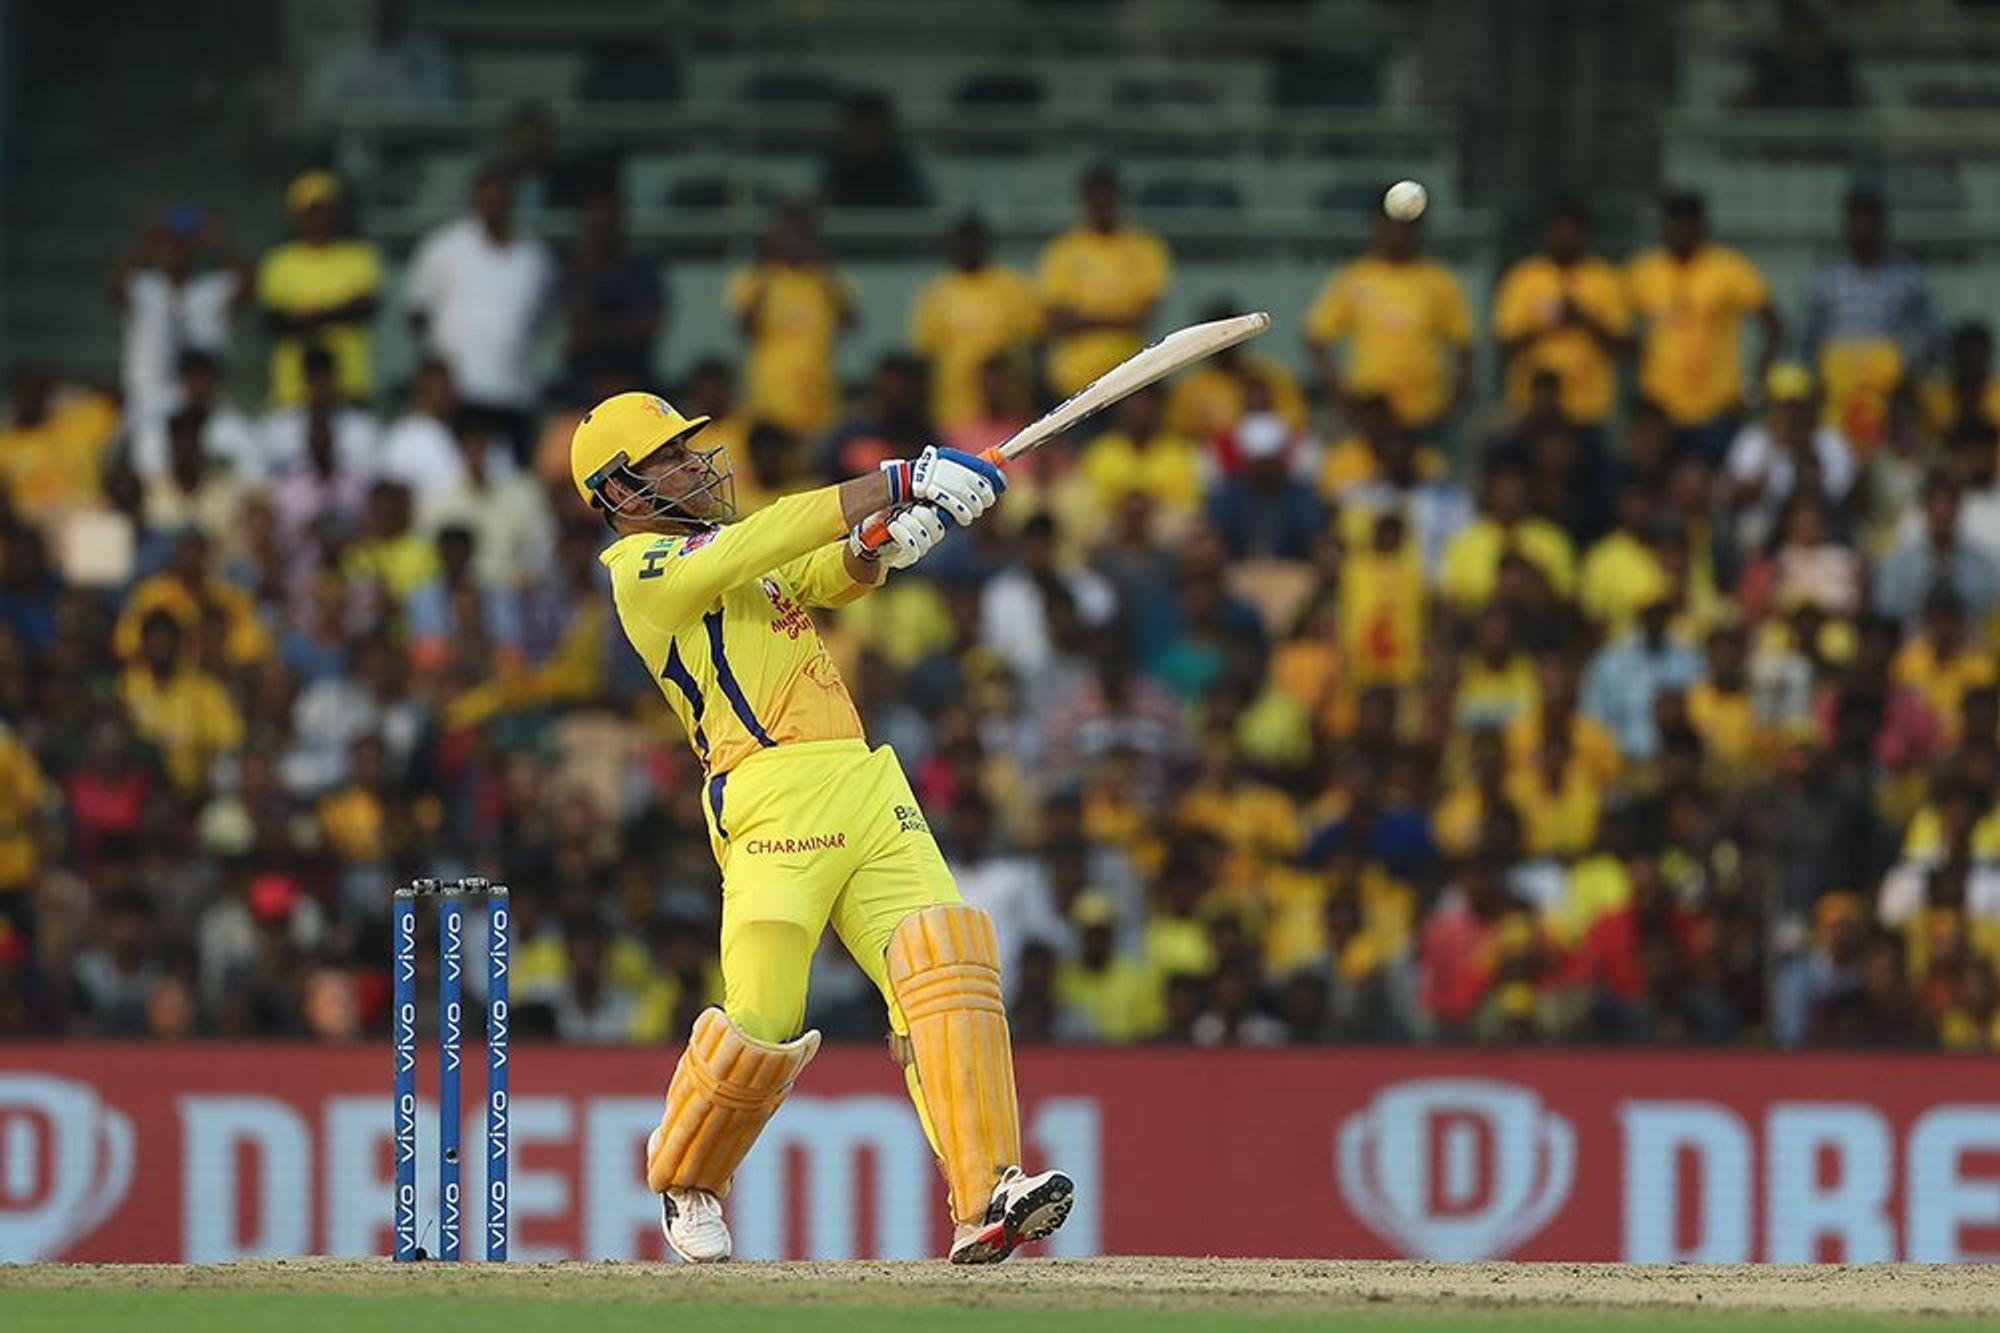 आईपीएल 2019 : जीत दर्ज करते ही इतिहास रच देंगे धोनी ऐसा करने वाले बन जाएँगे पहले कप्तान 1